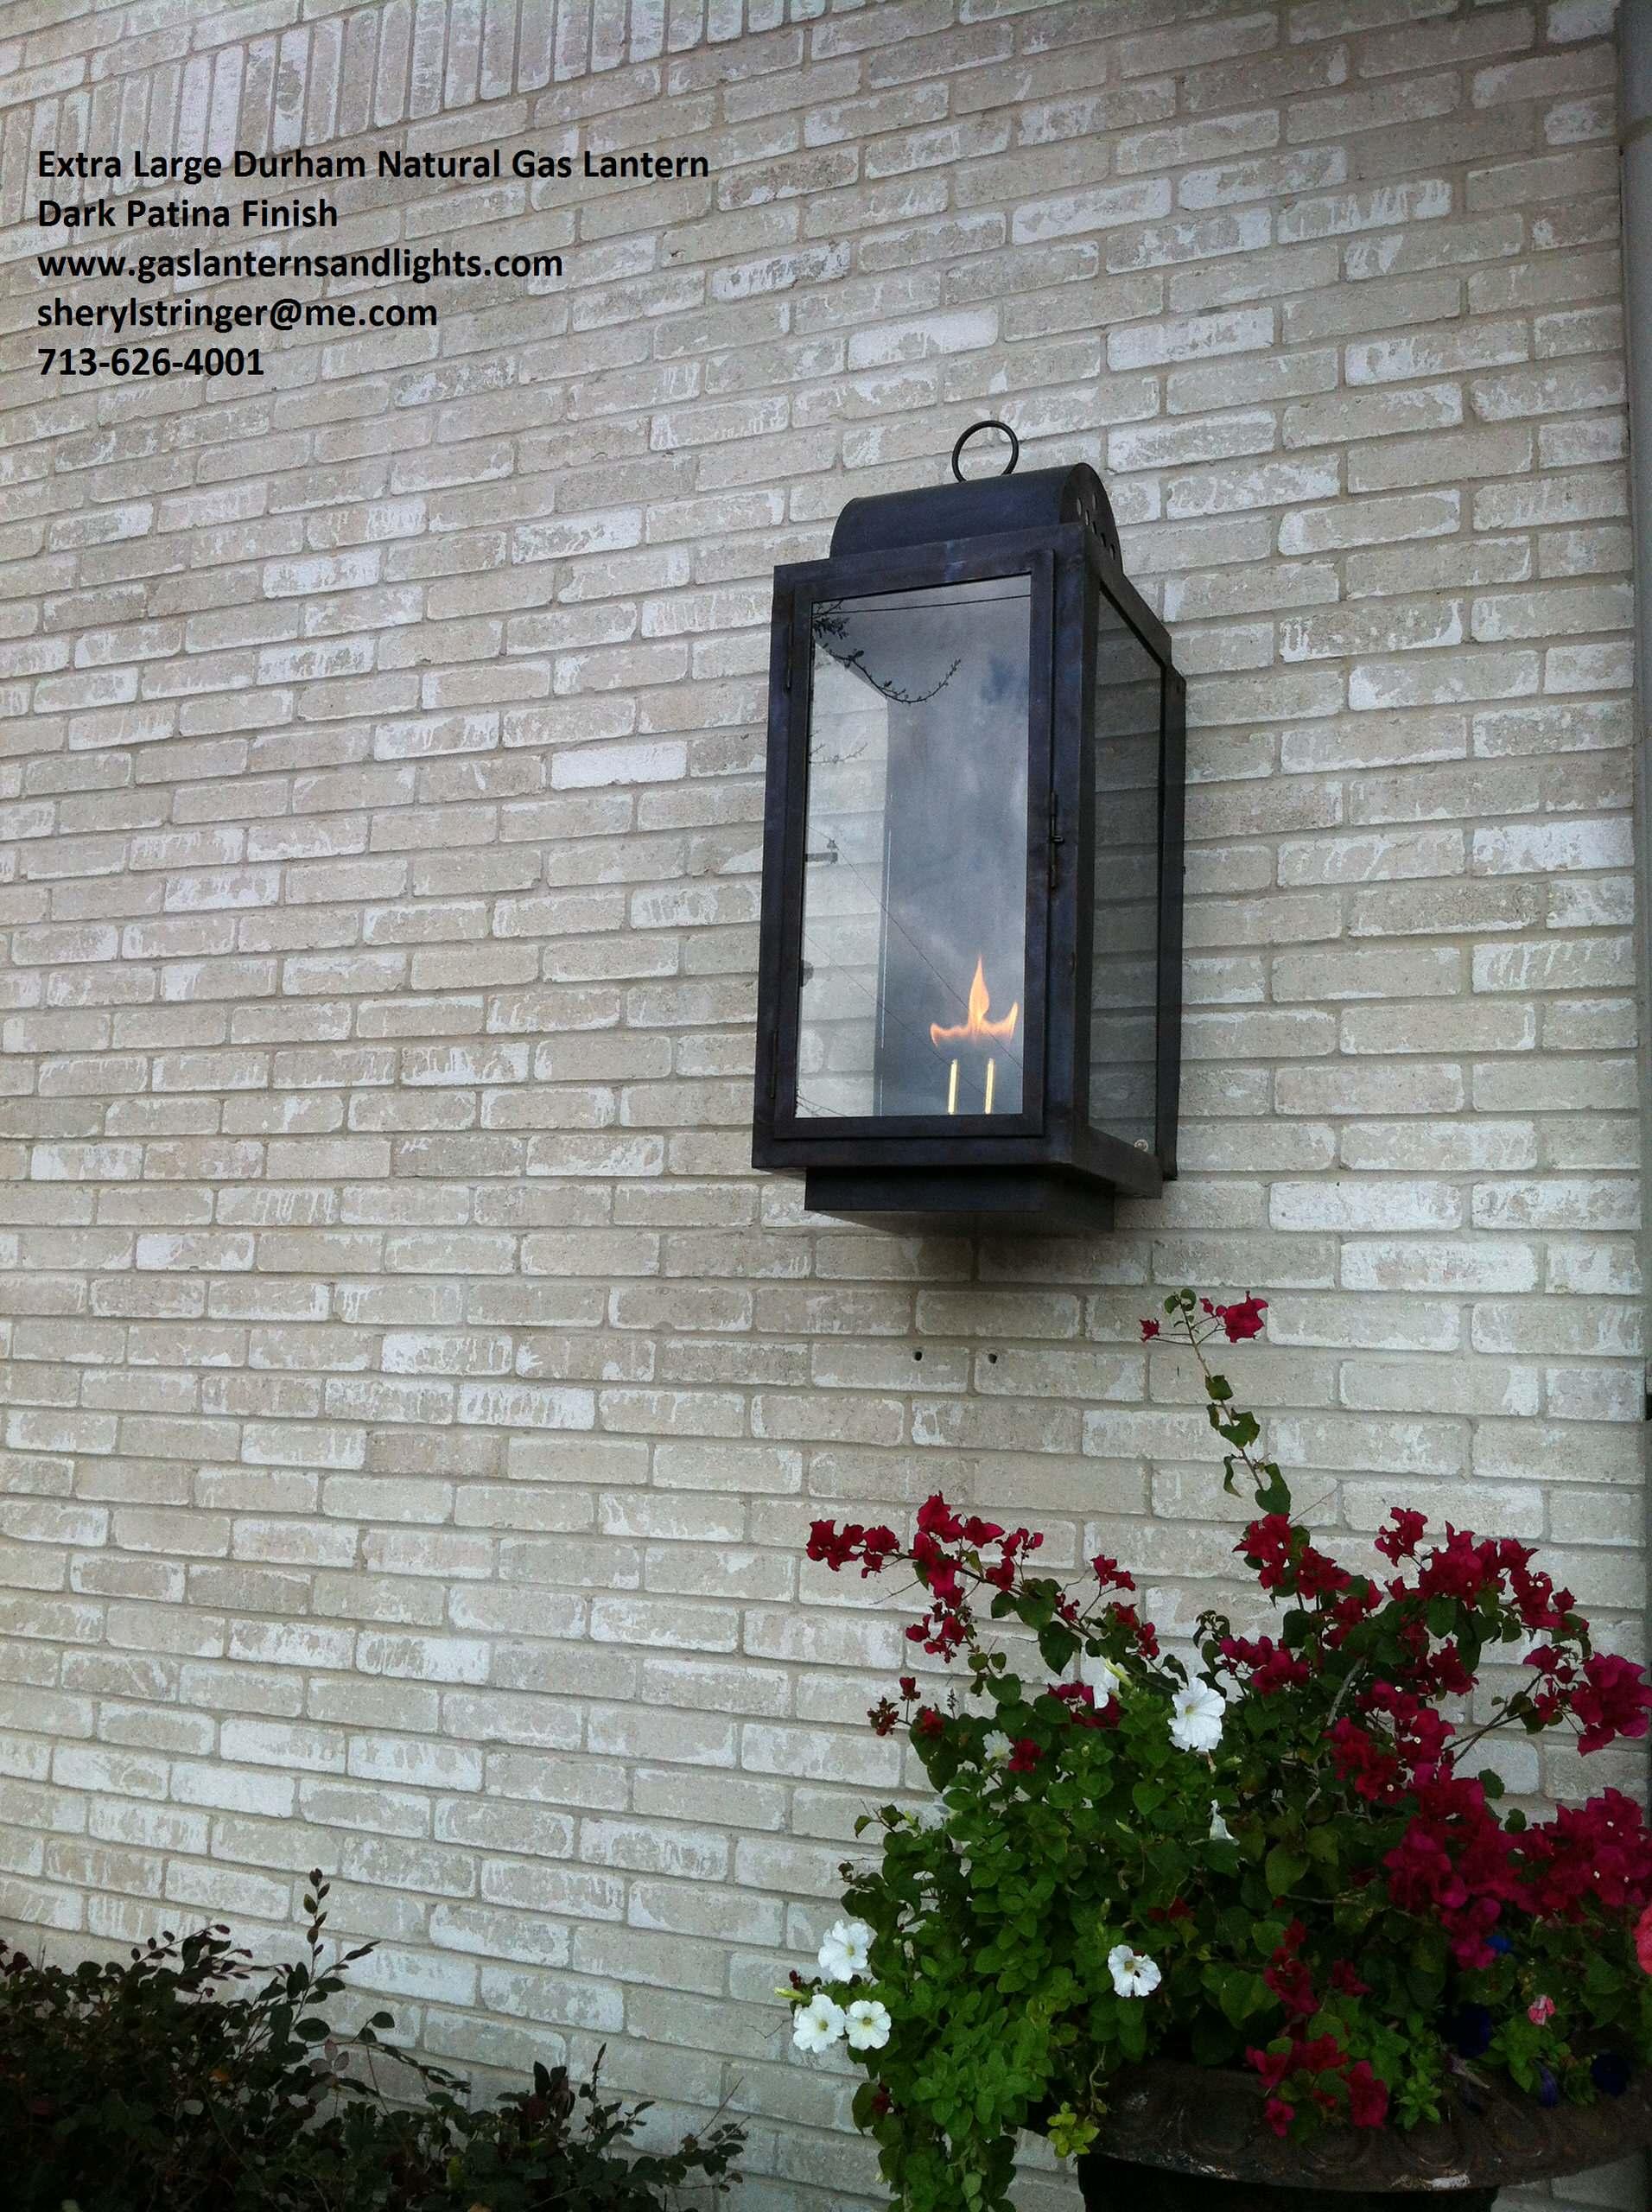 Sheryl's Durham Gas Lanterns